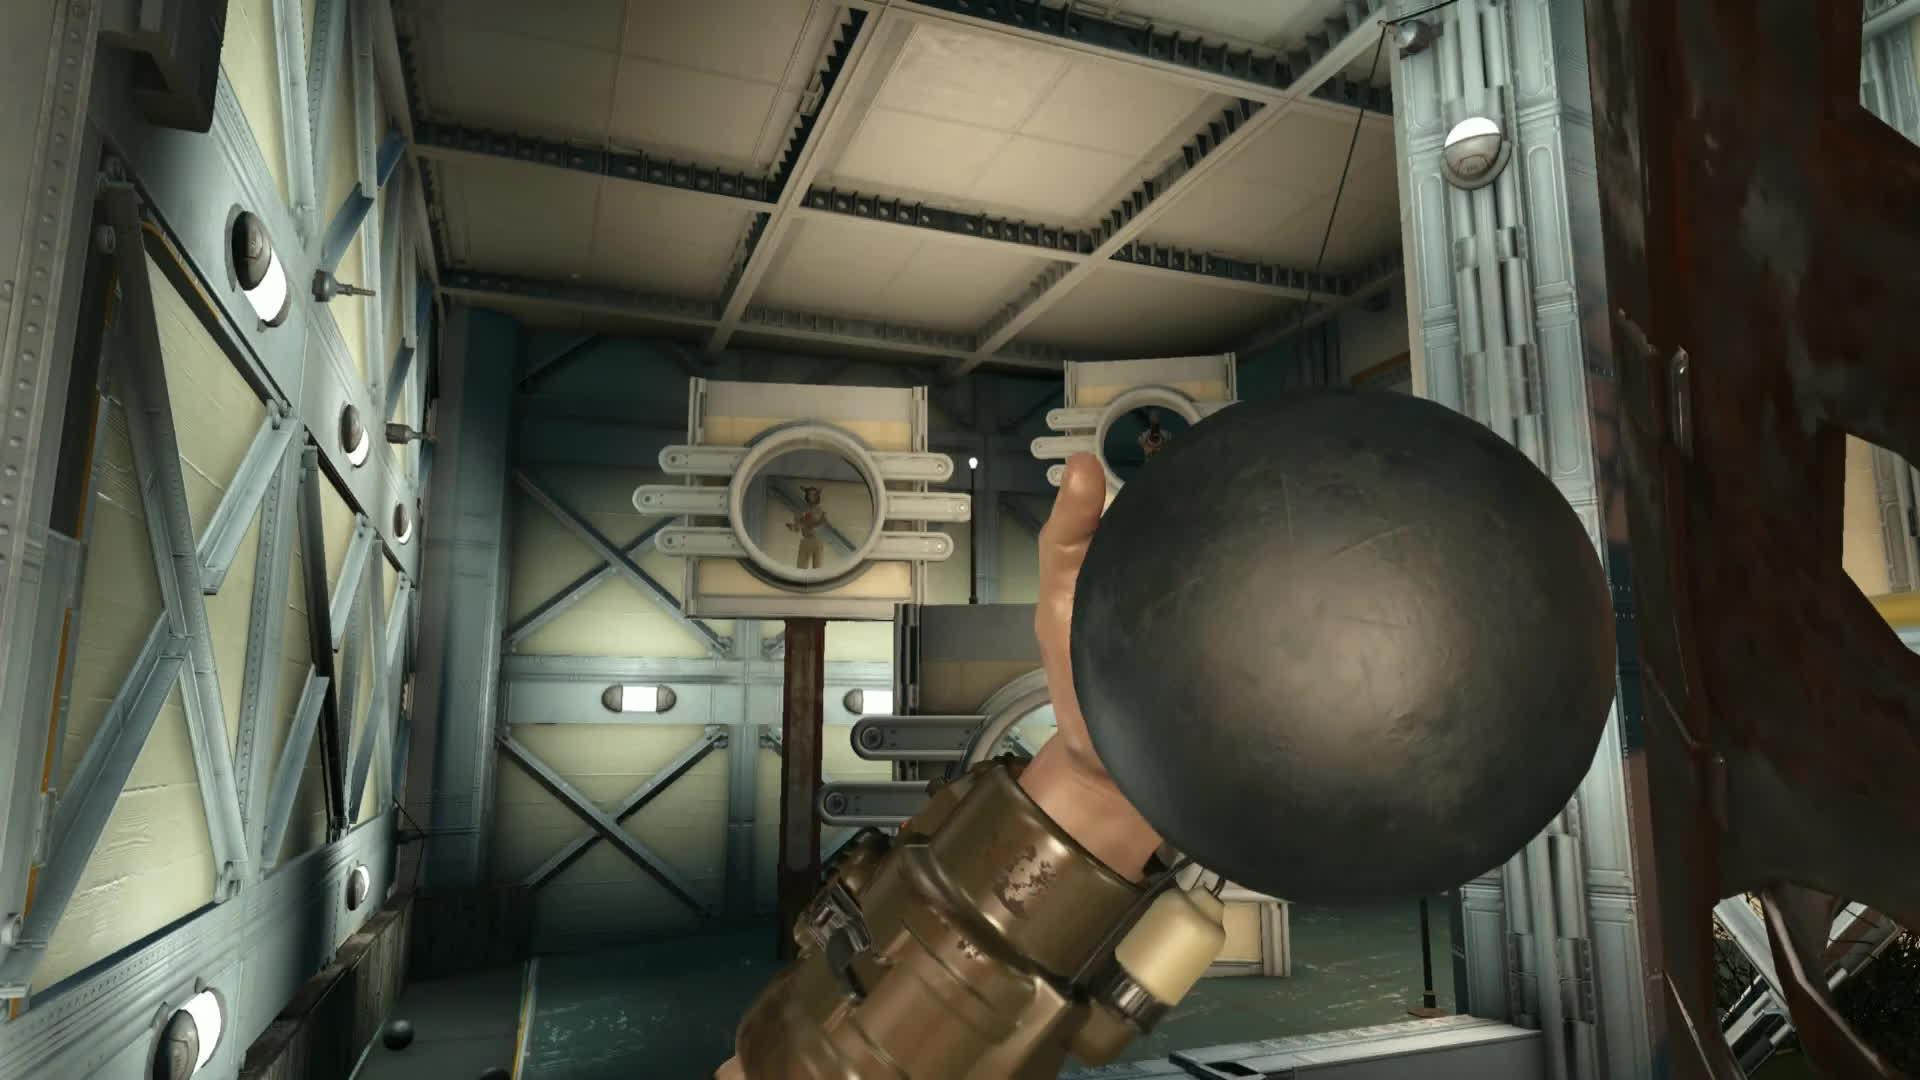 Bowling Ball Shooting Range - Robbaz GIFs